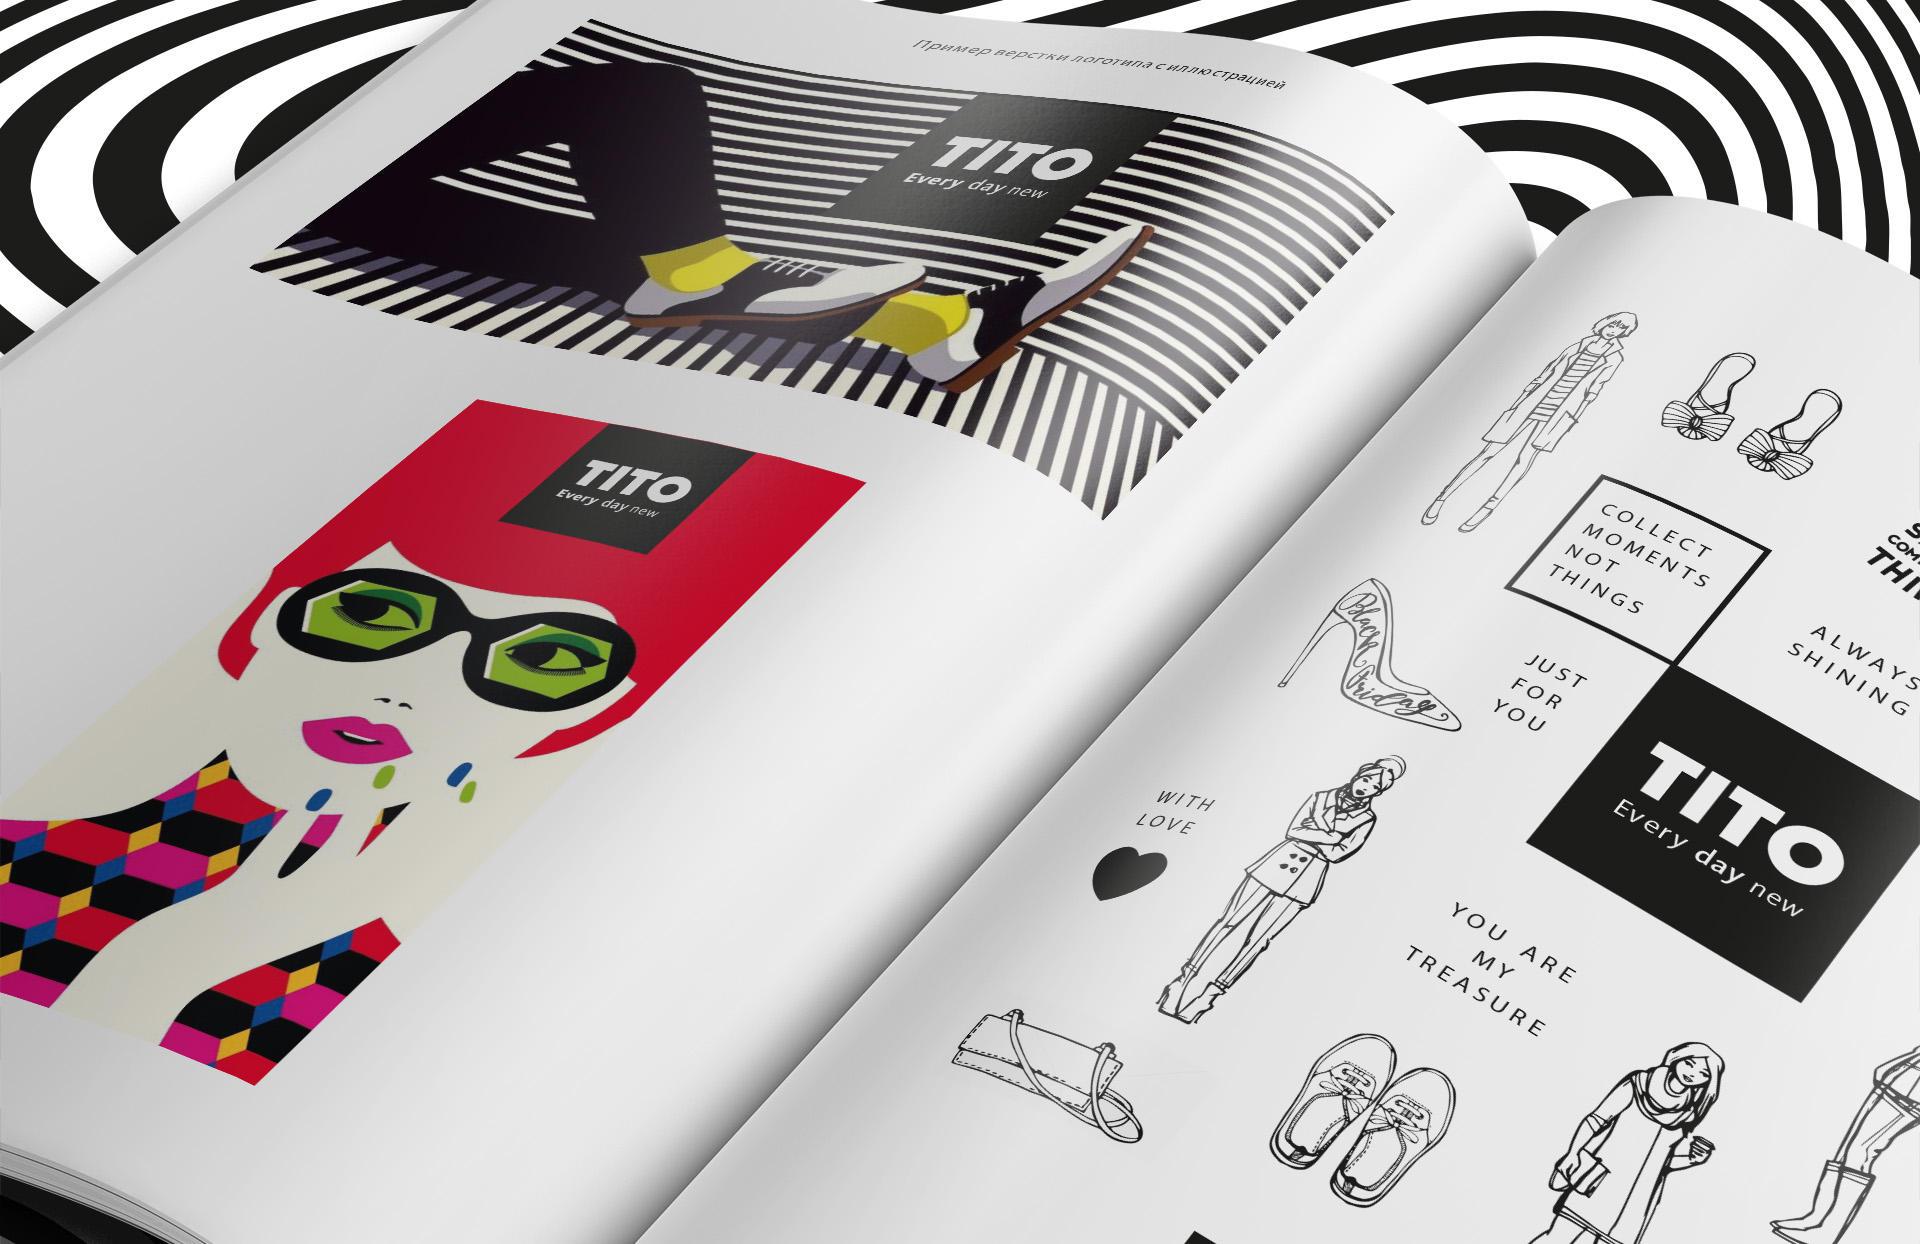 Clothing brand brandbook, brand book для бренда clothes